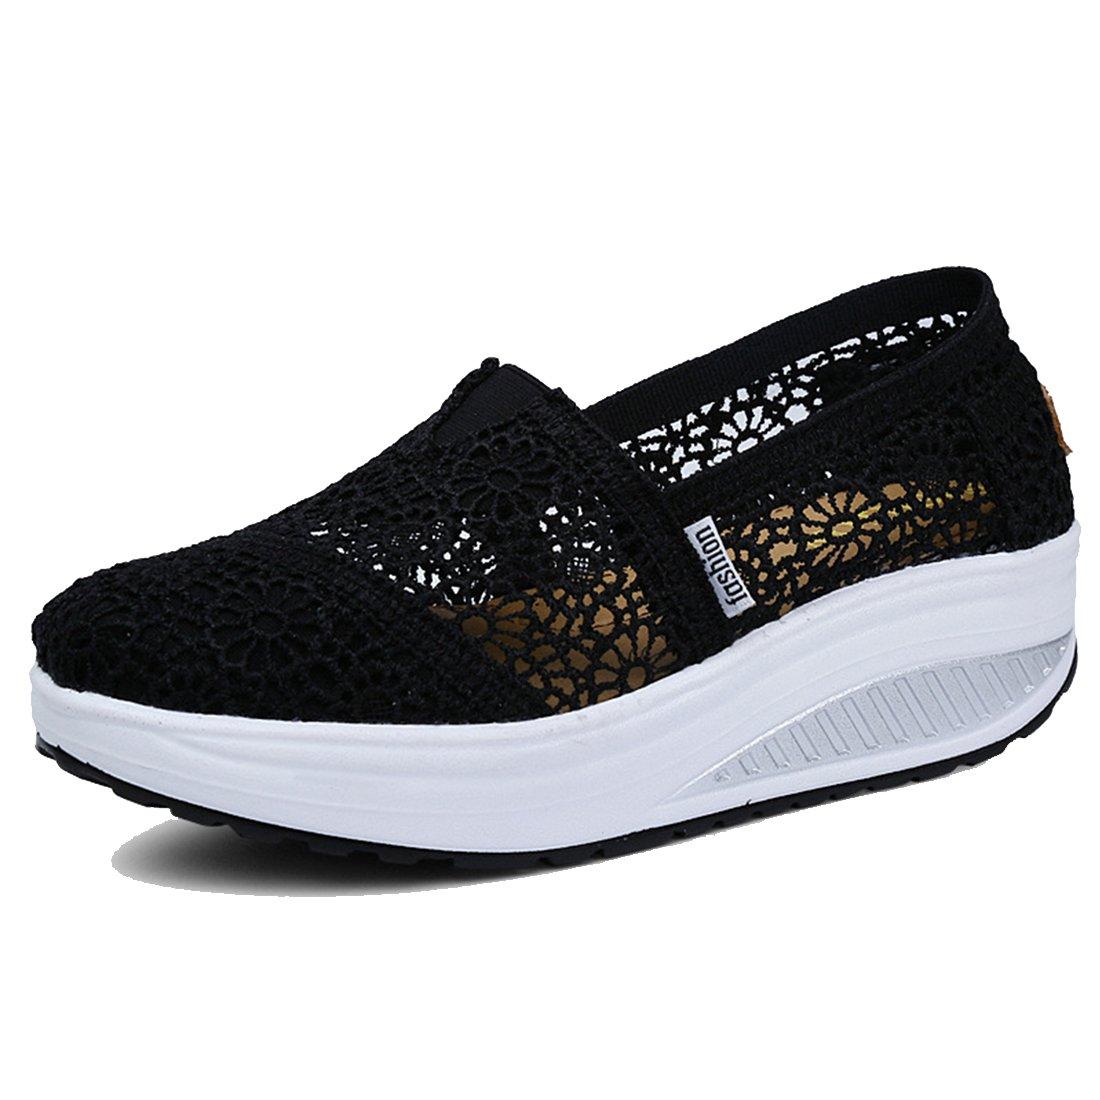 Women's Mesh Platform Walking Shoes Lightweight Slip-on Fitness Work Out Sneaker Shoes (7.5 B(M) US, Black1)